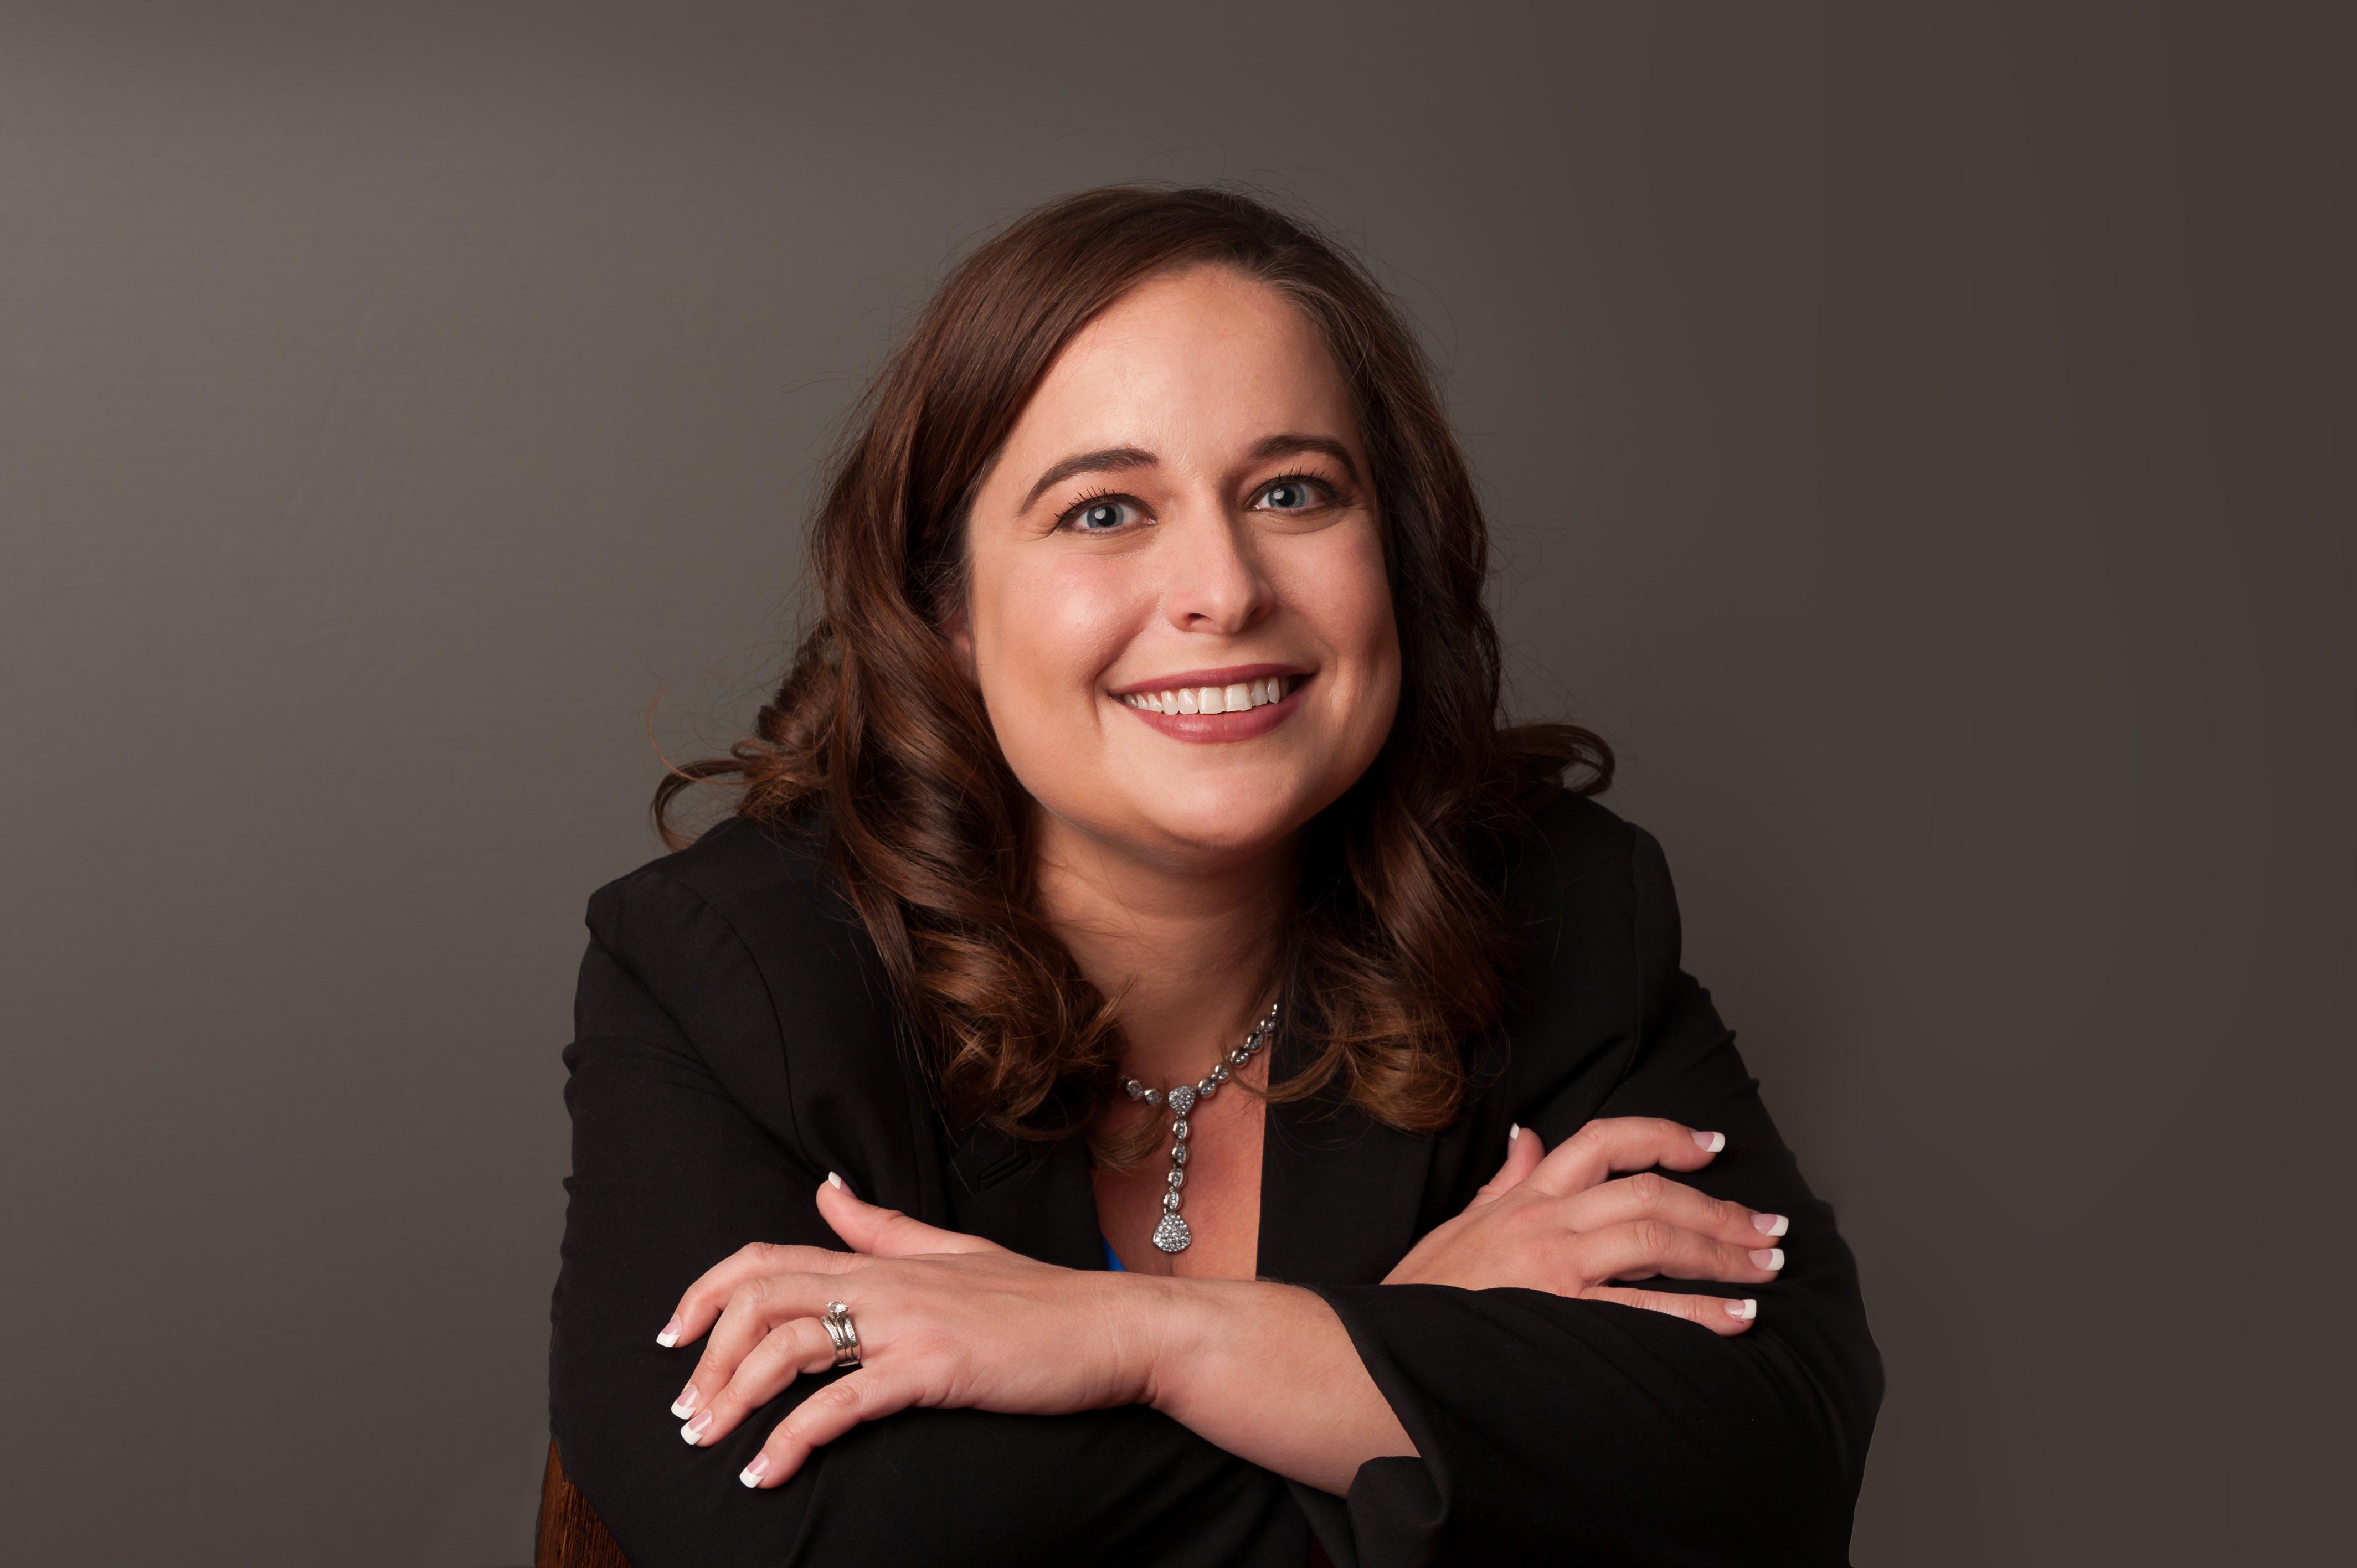 Natalie G. Oven PA